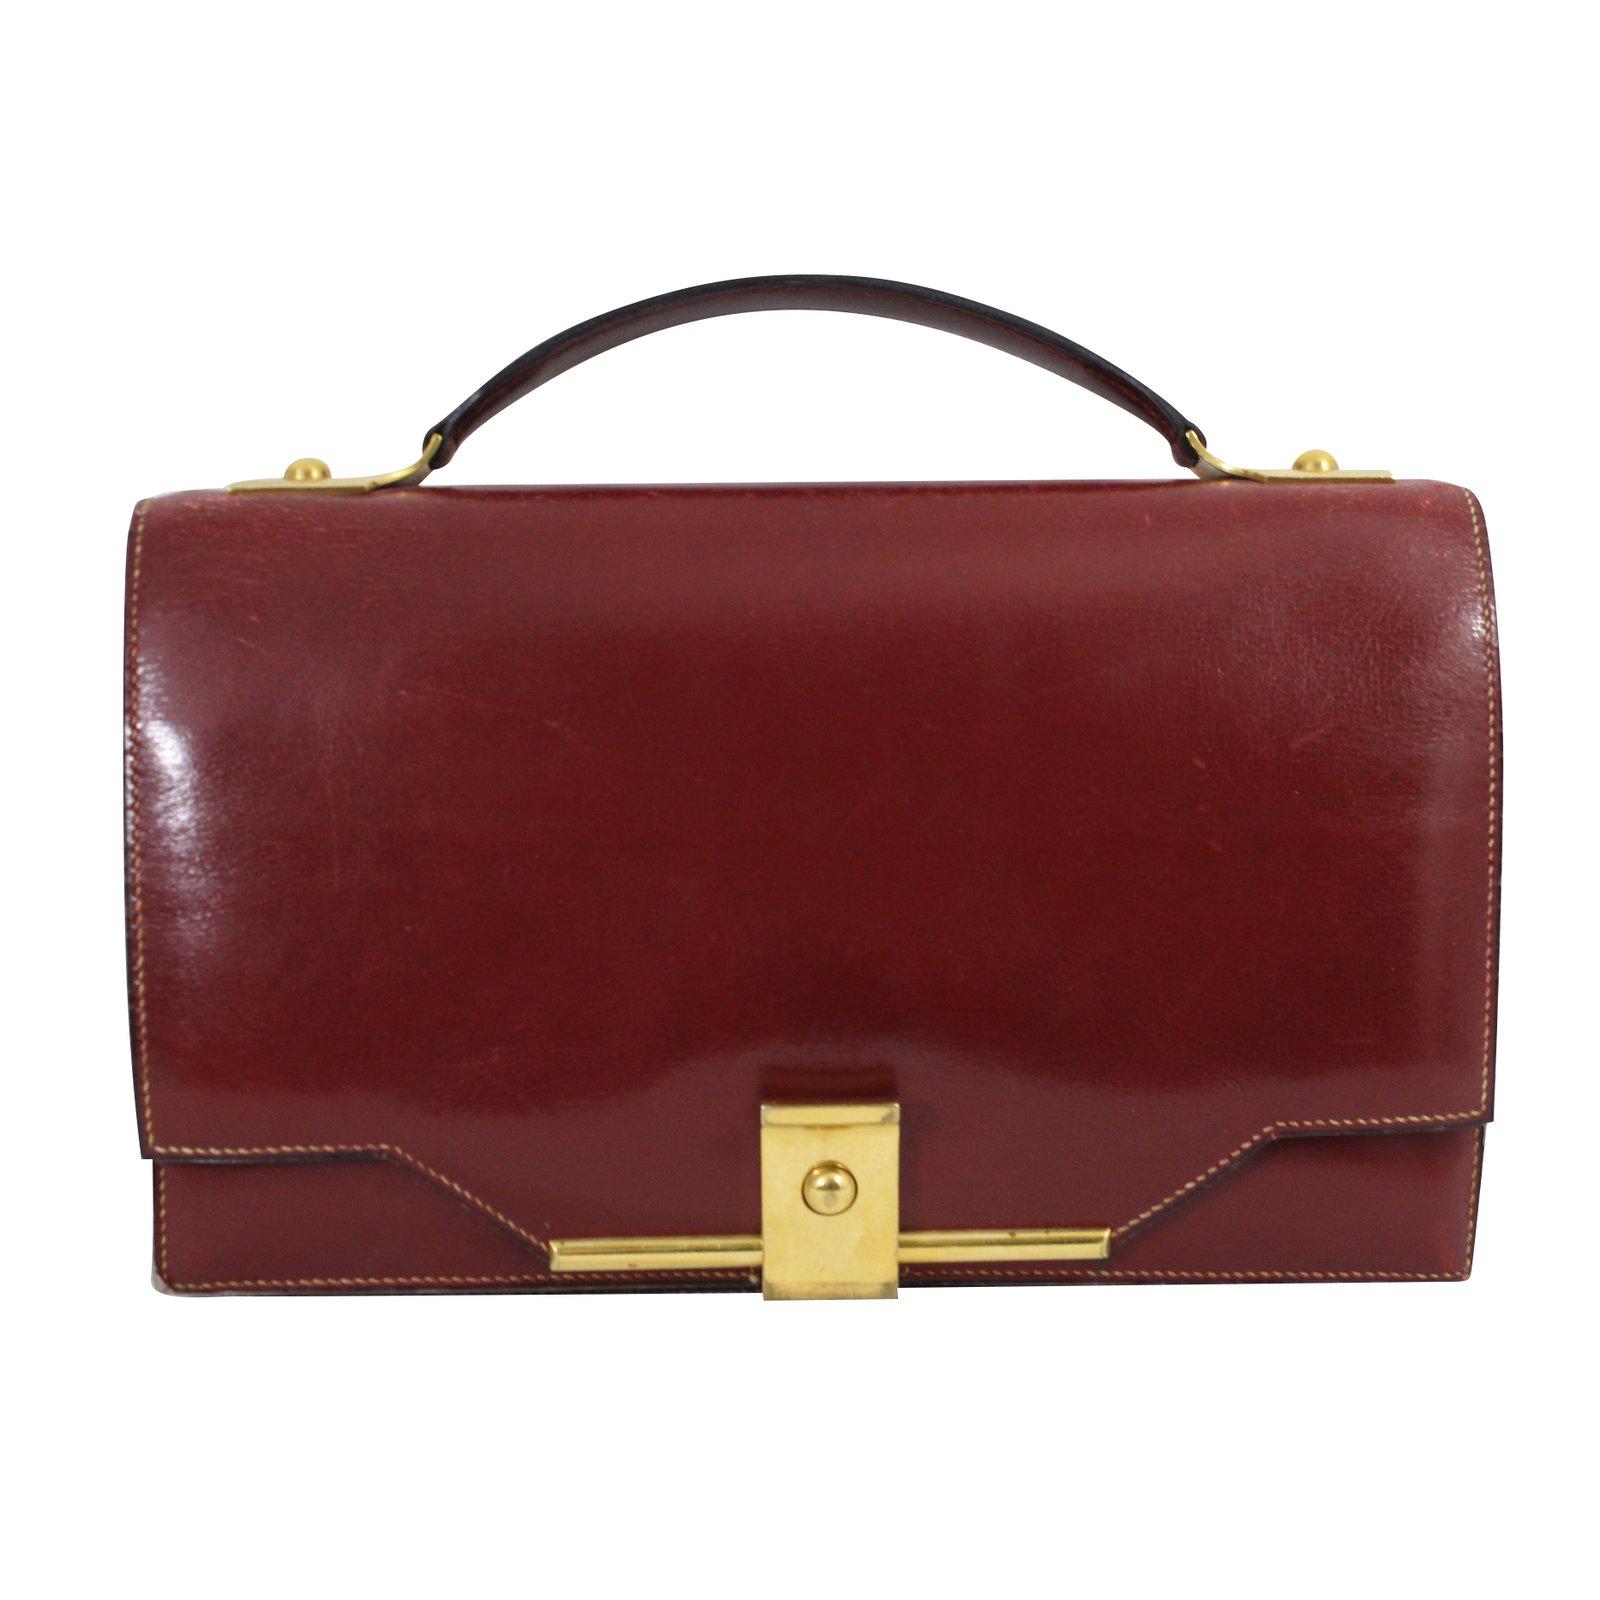 447b92da111f Hermès Vintage Clutch Handbags Leather Dark red ref.49060 - Joli Closet